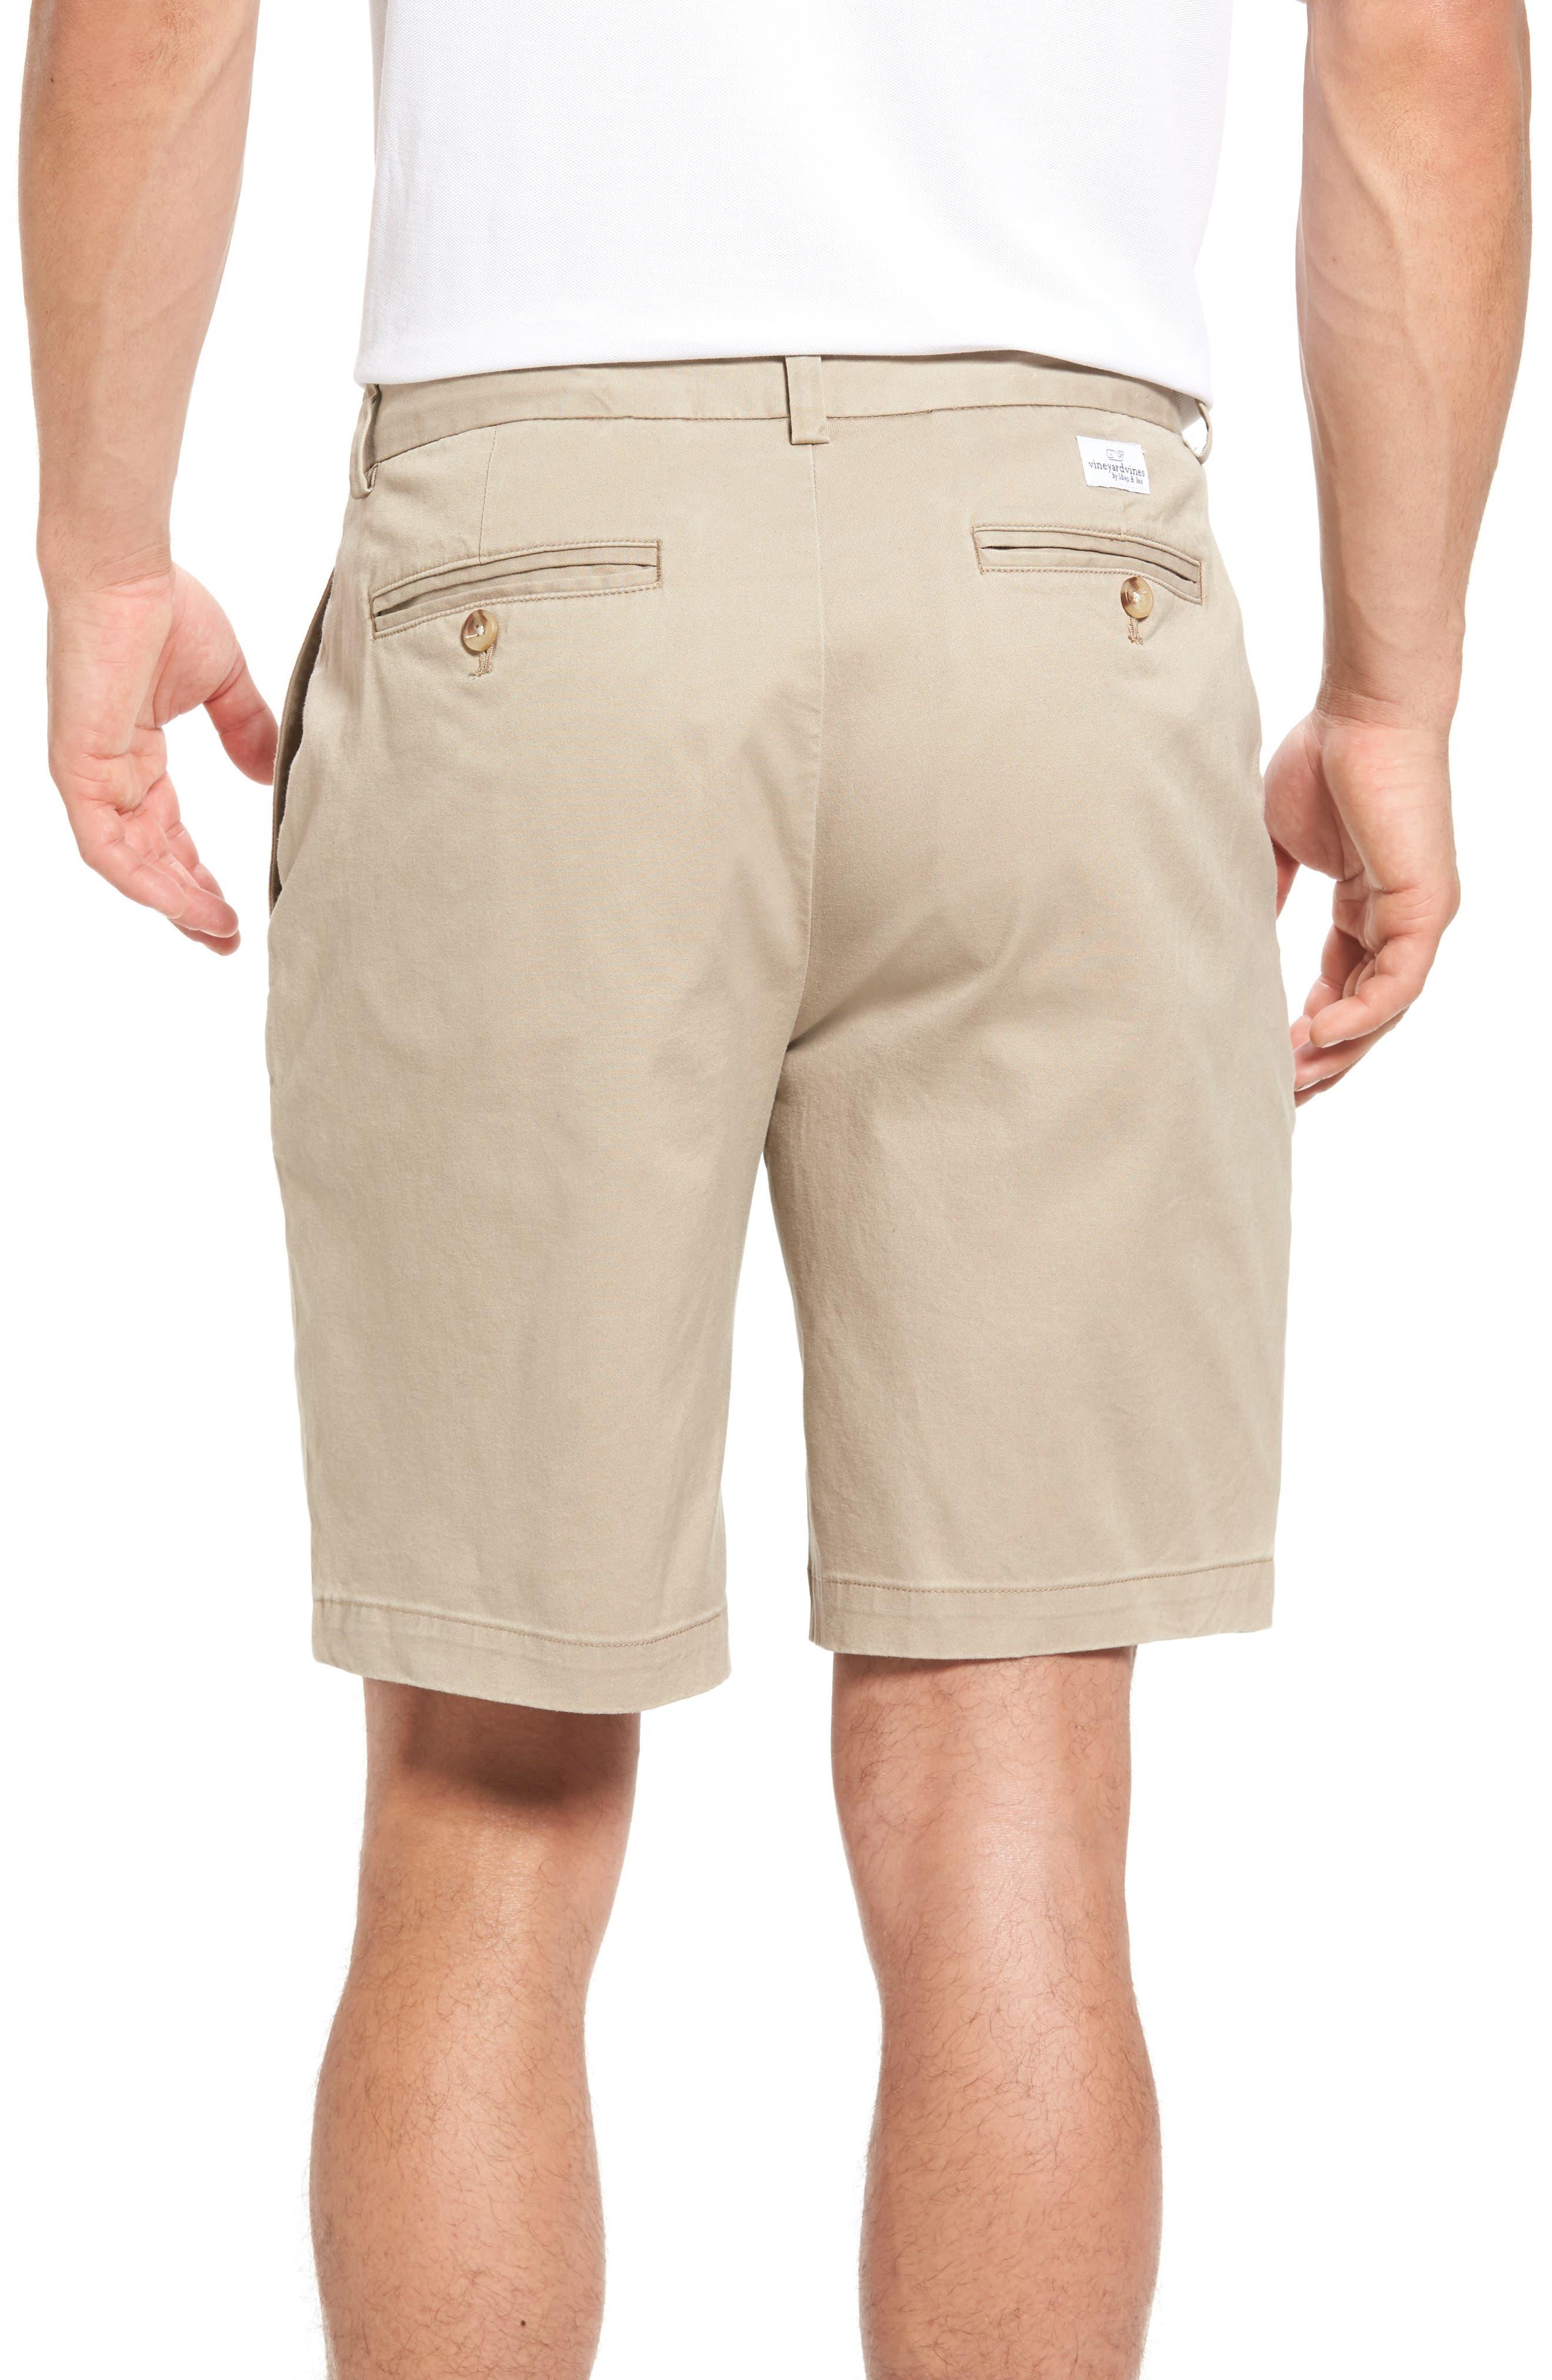 9 Inch Stretch Breaker Shorts,                             Alternate thumbnail 2, color,                             Khaki